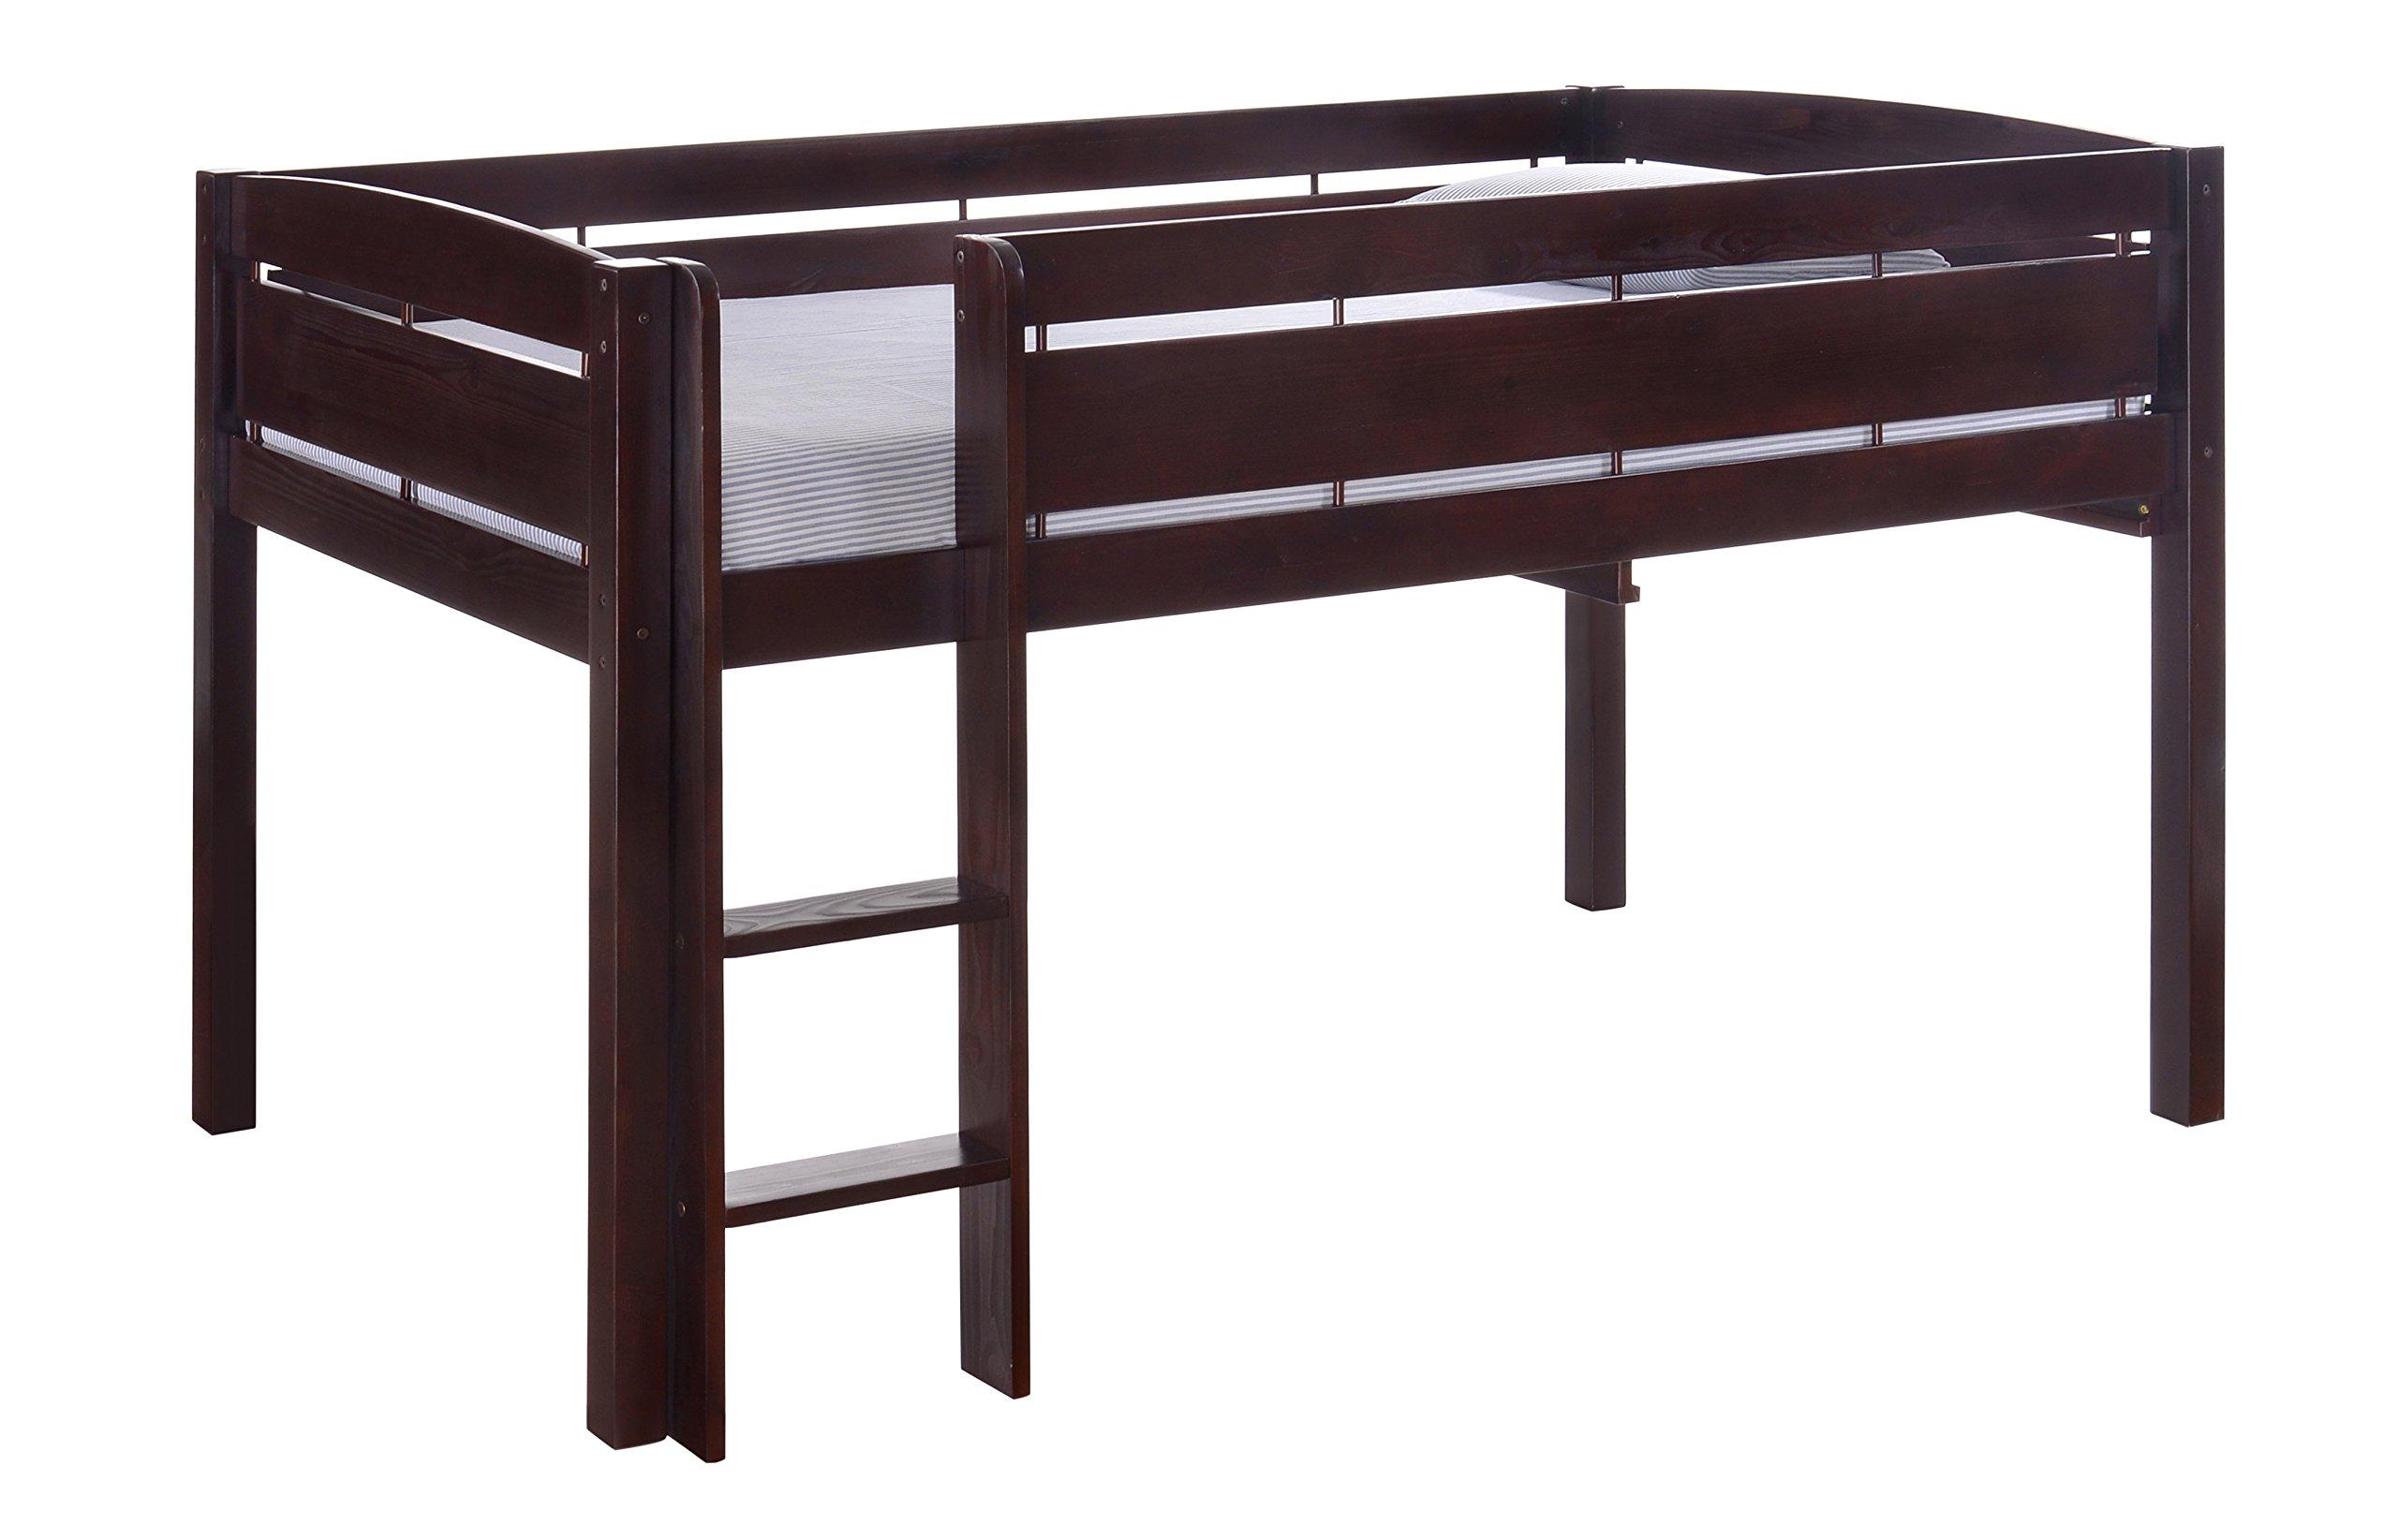 Canwood Whistler Junior Loft Bed, Espresso